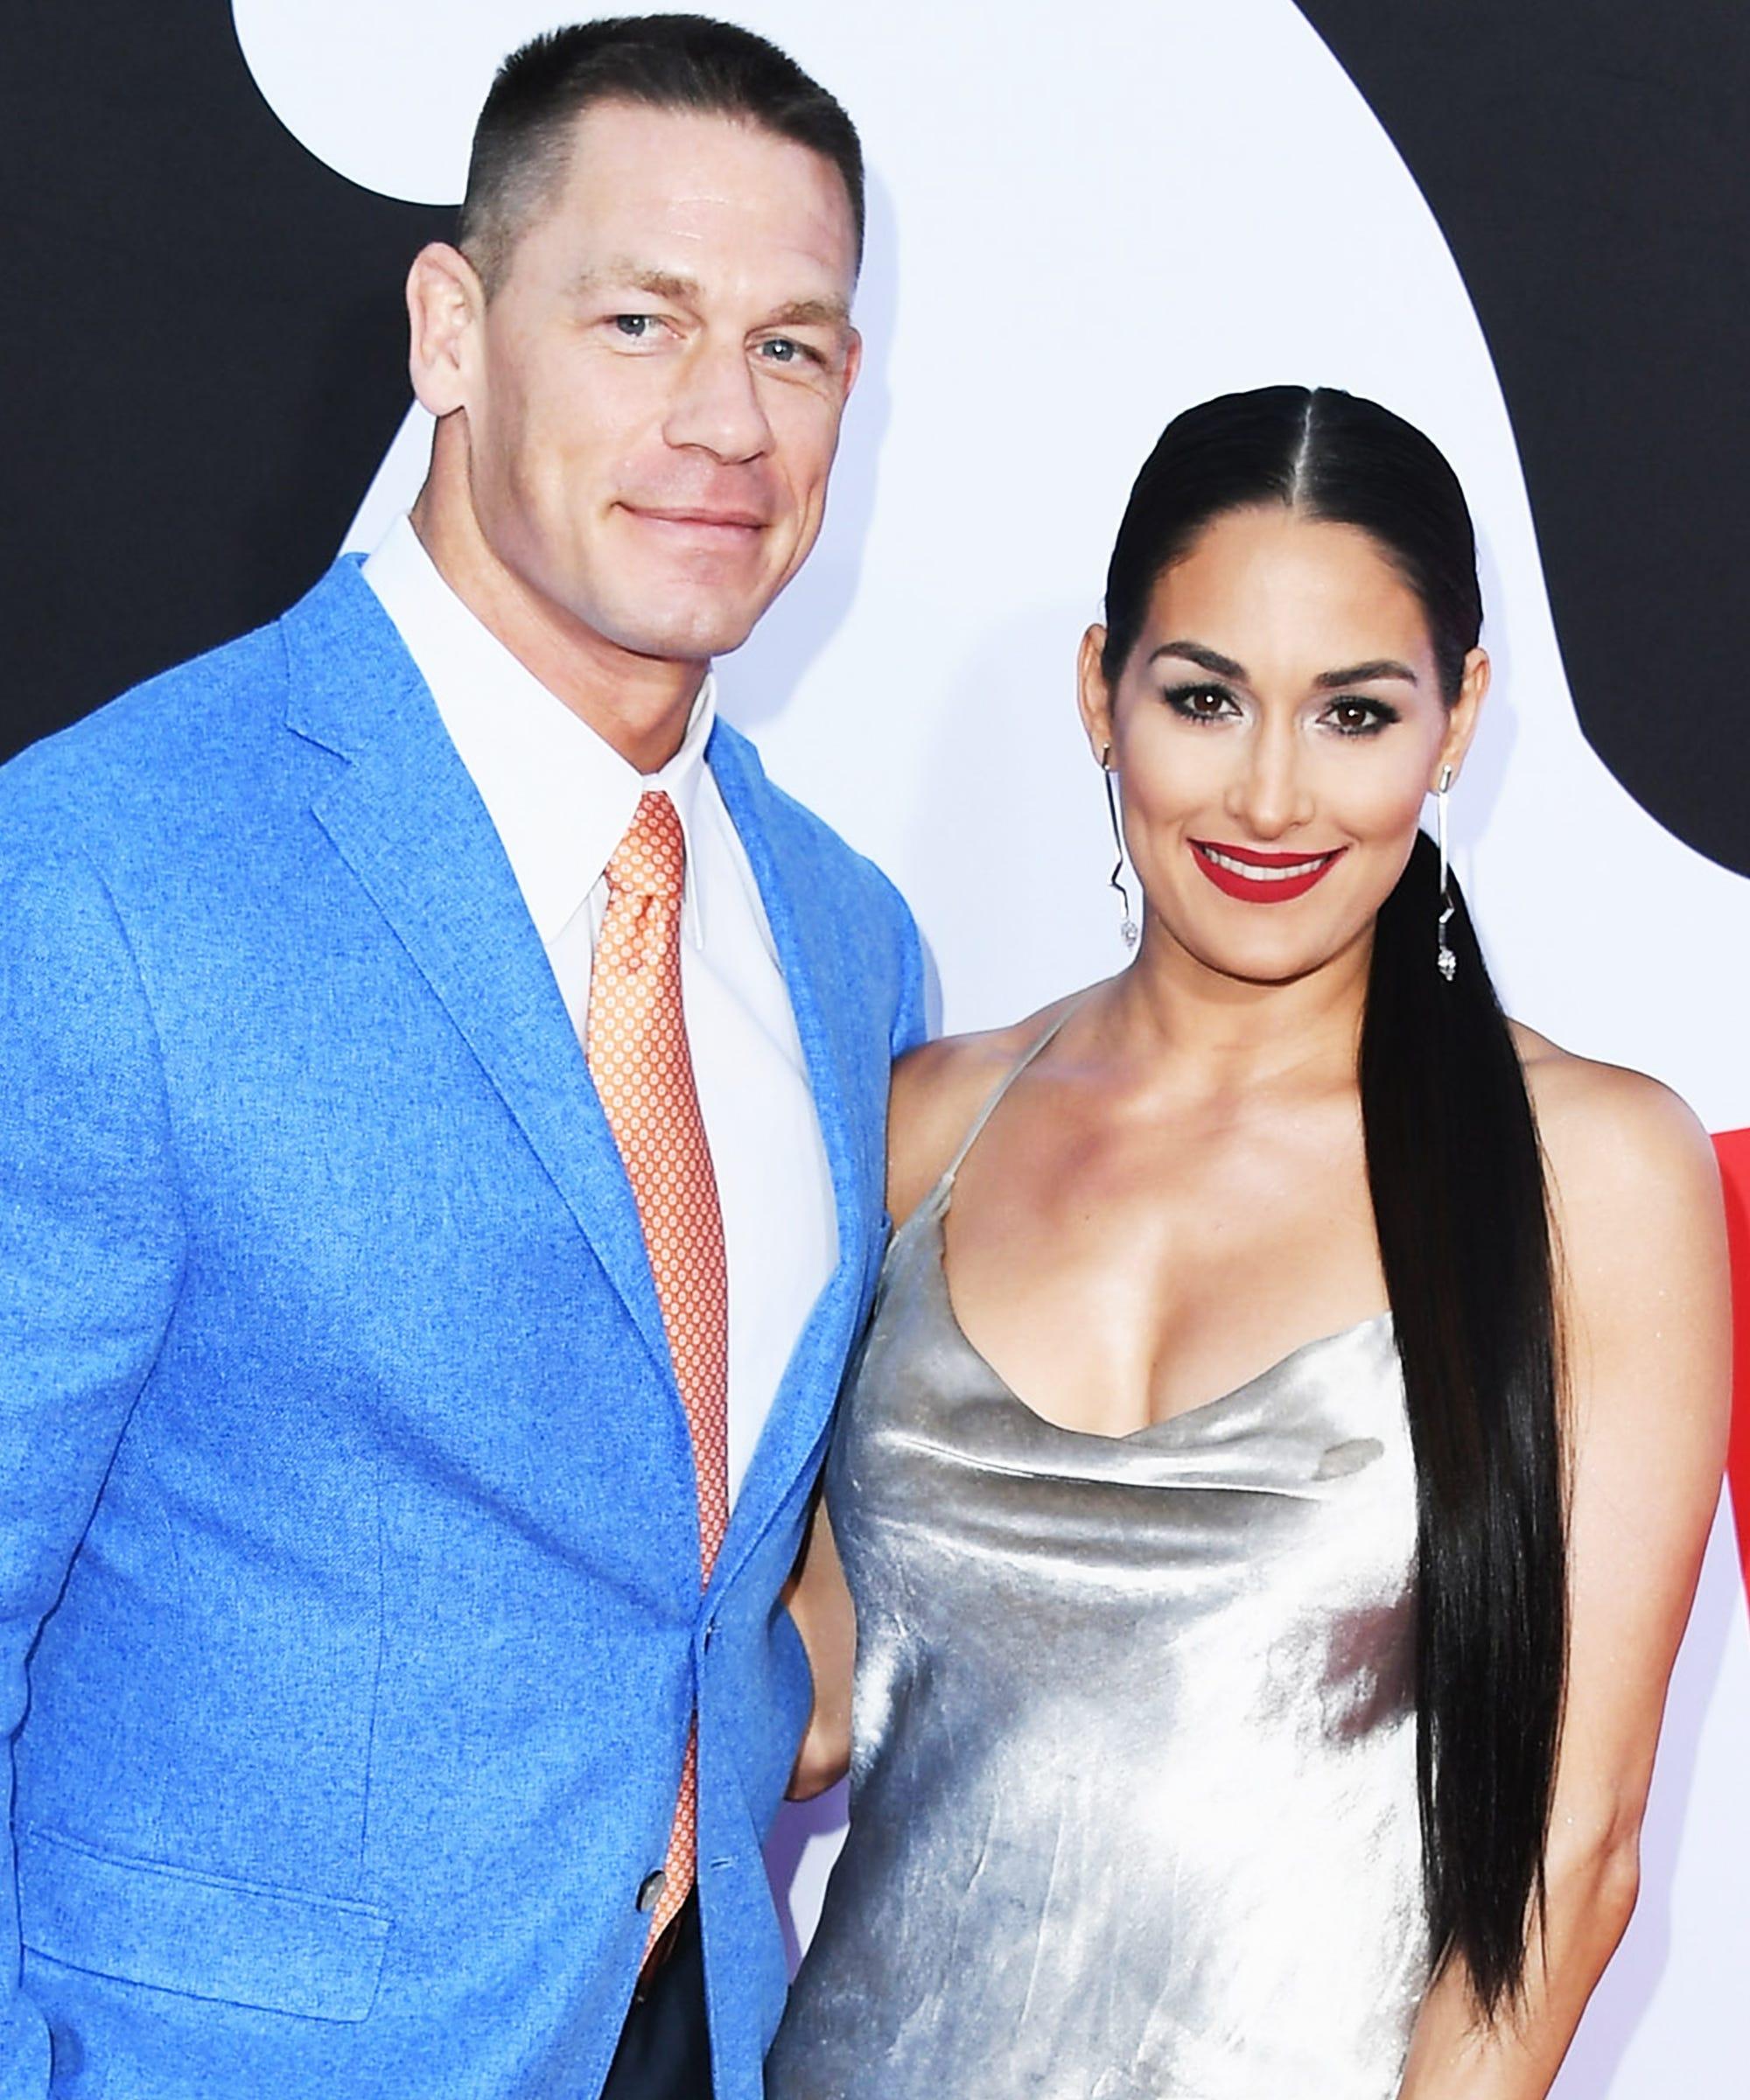 John Cena And Nikki Bella Show Breakup On Reality Show